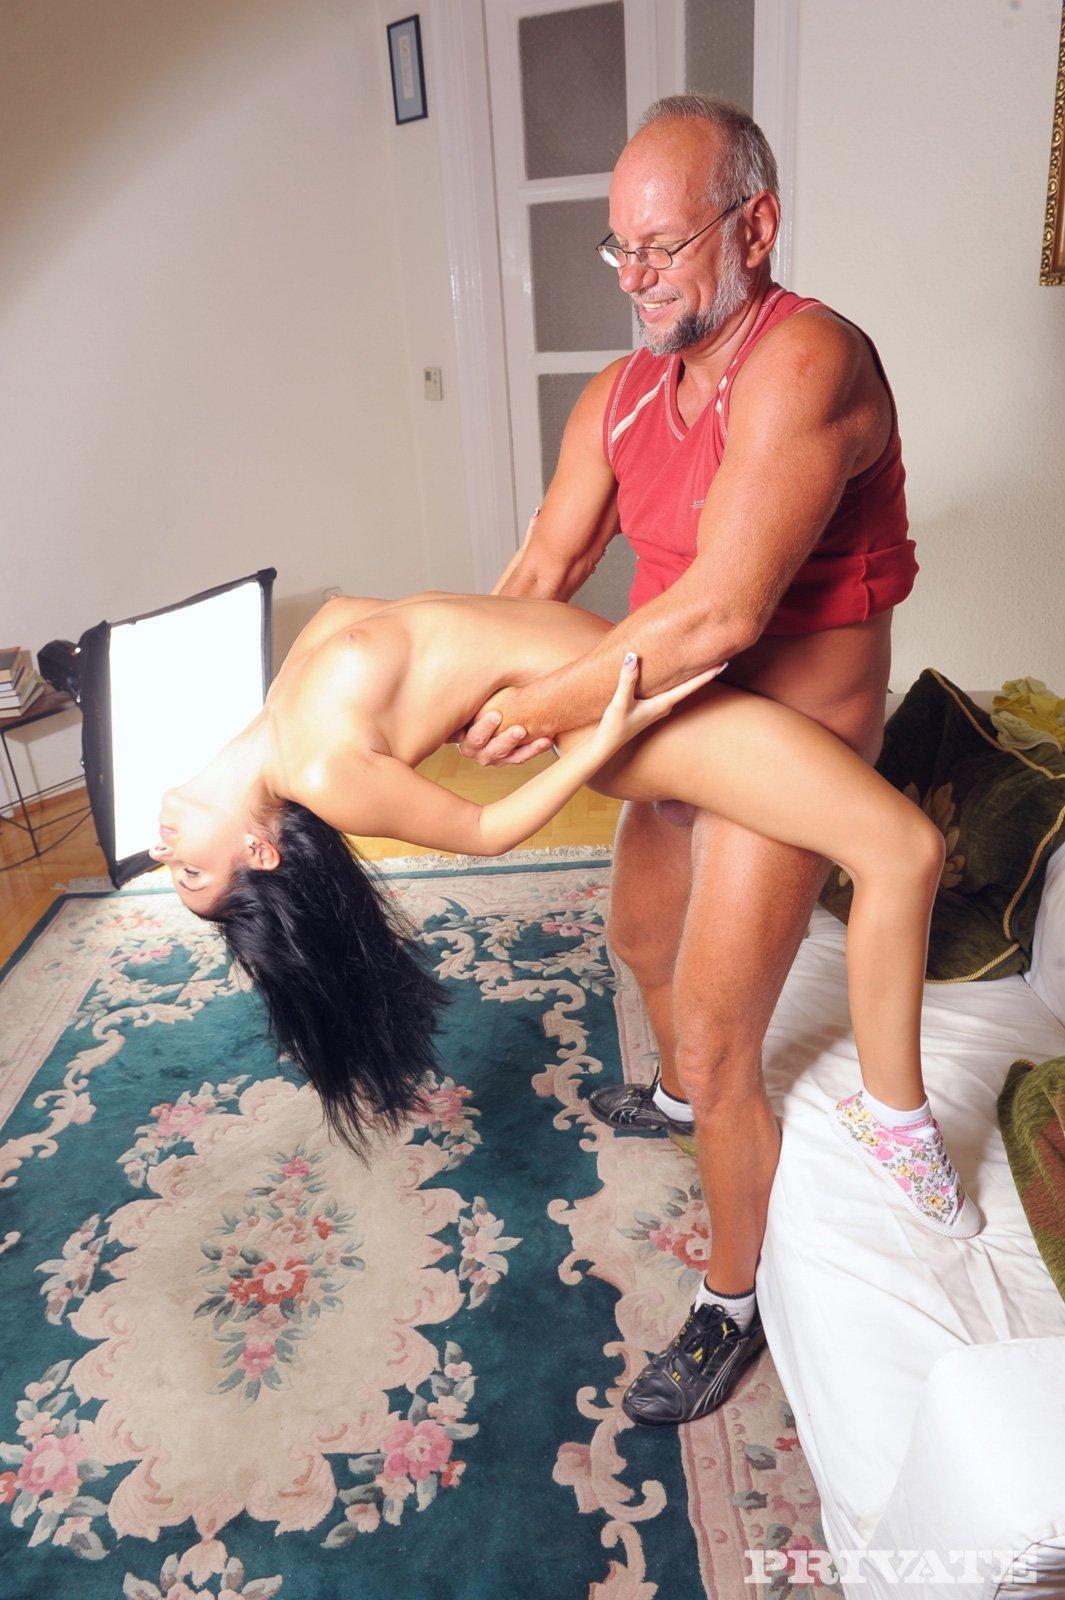 Секс в анус закончился семяизвержение на лицо молодые сучки в исполнении старика